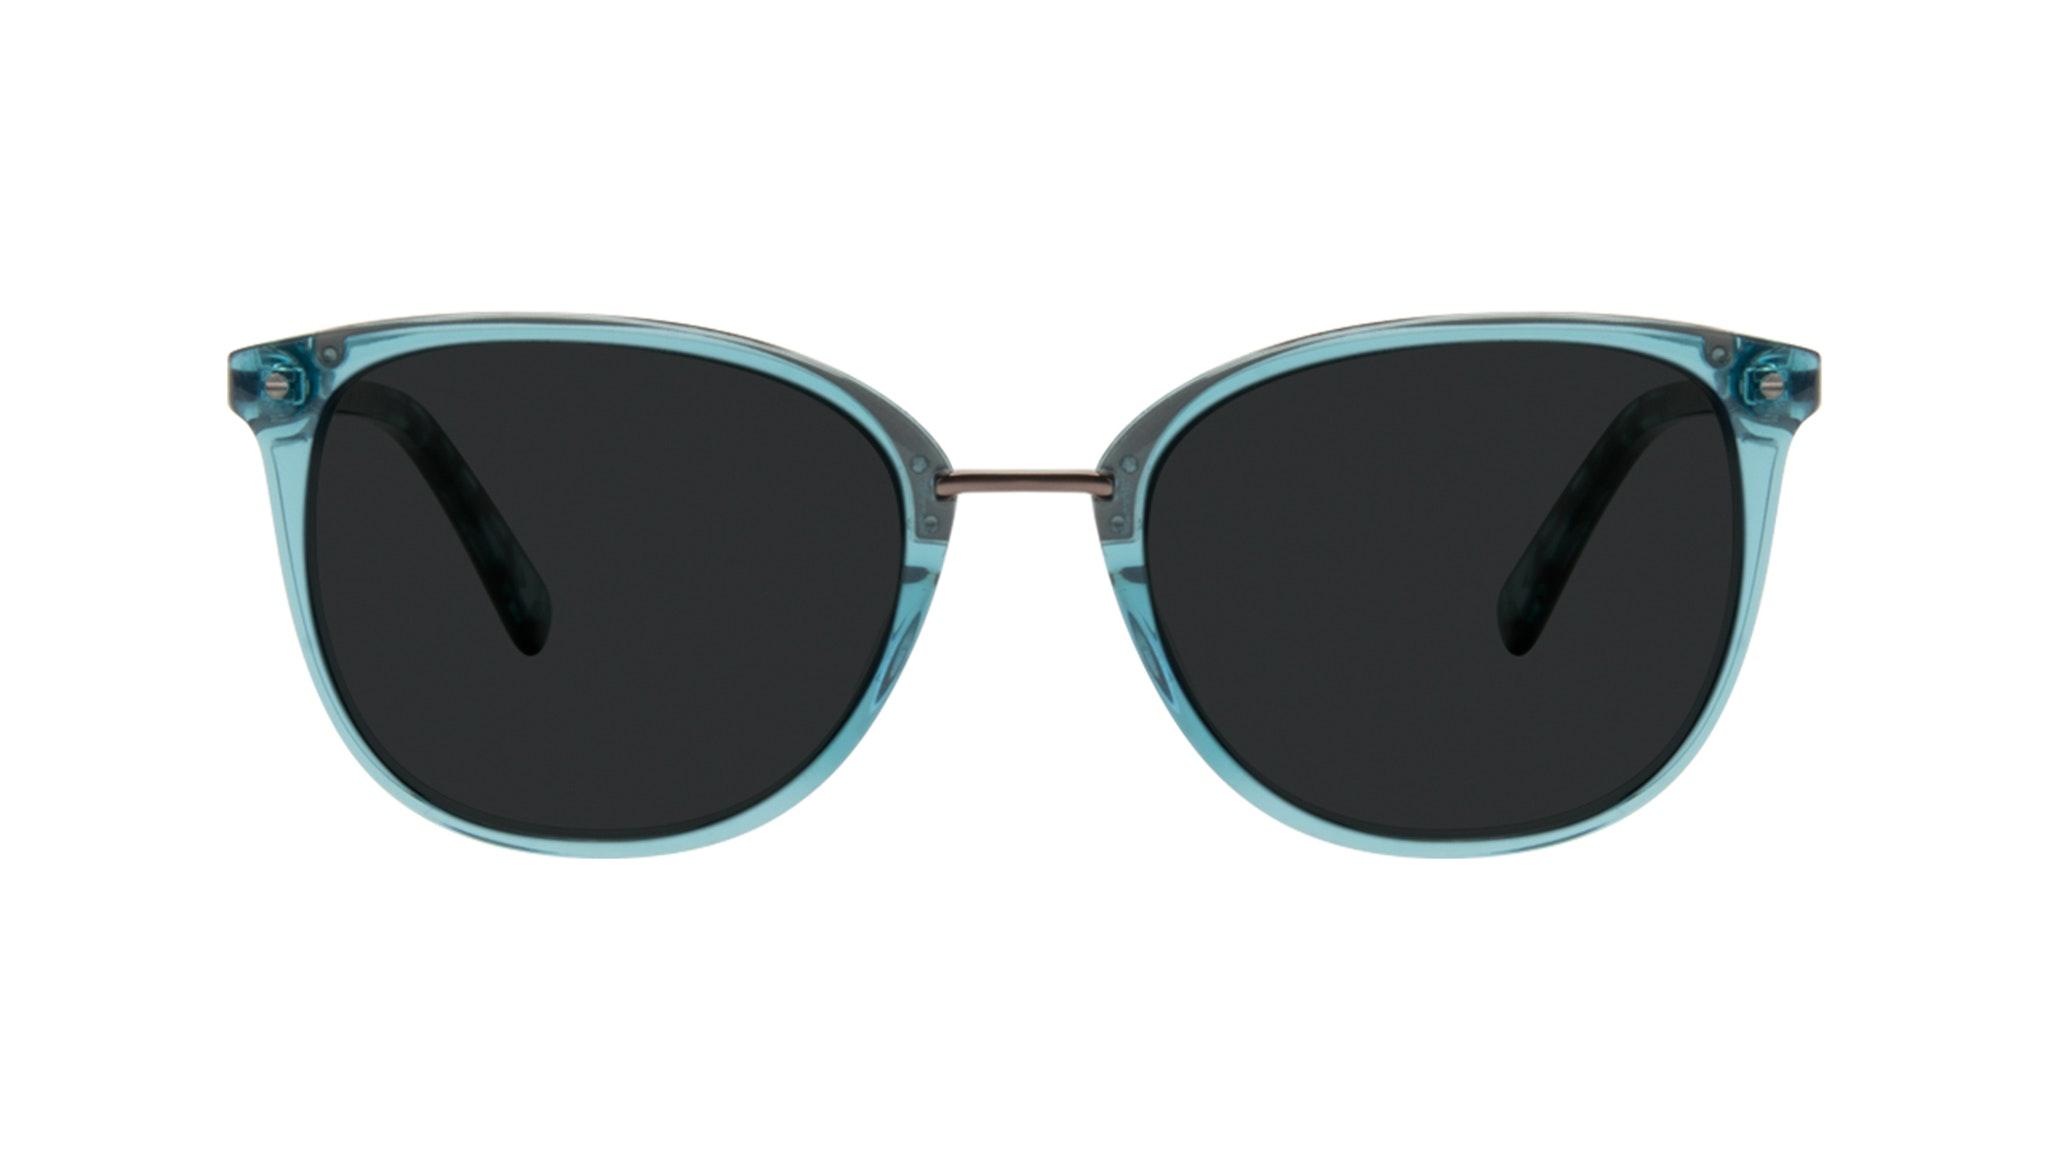 Affordable Fashion Glasses Square Round Sunglasses Women Bella Teal